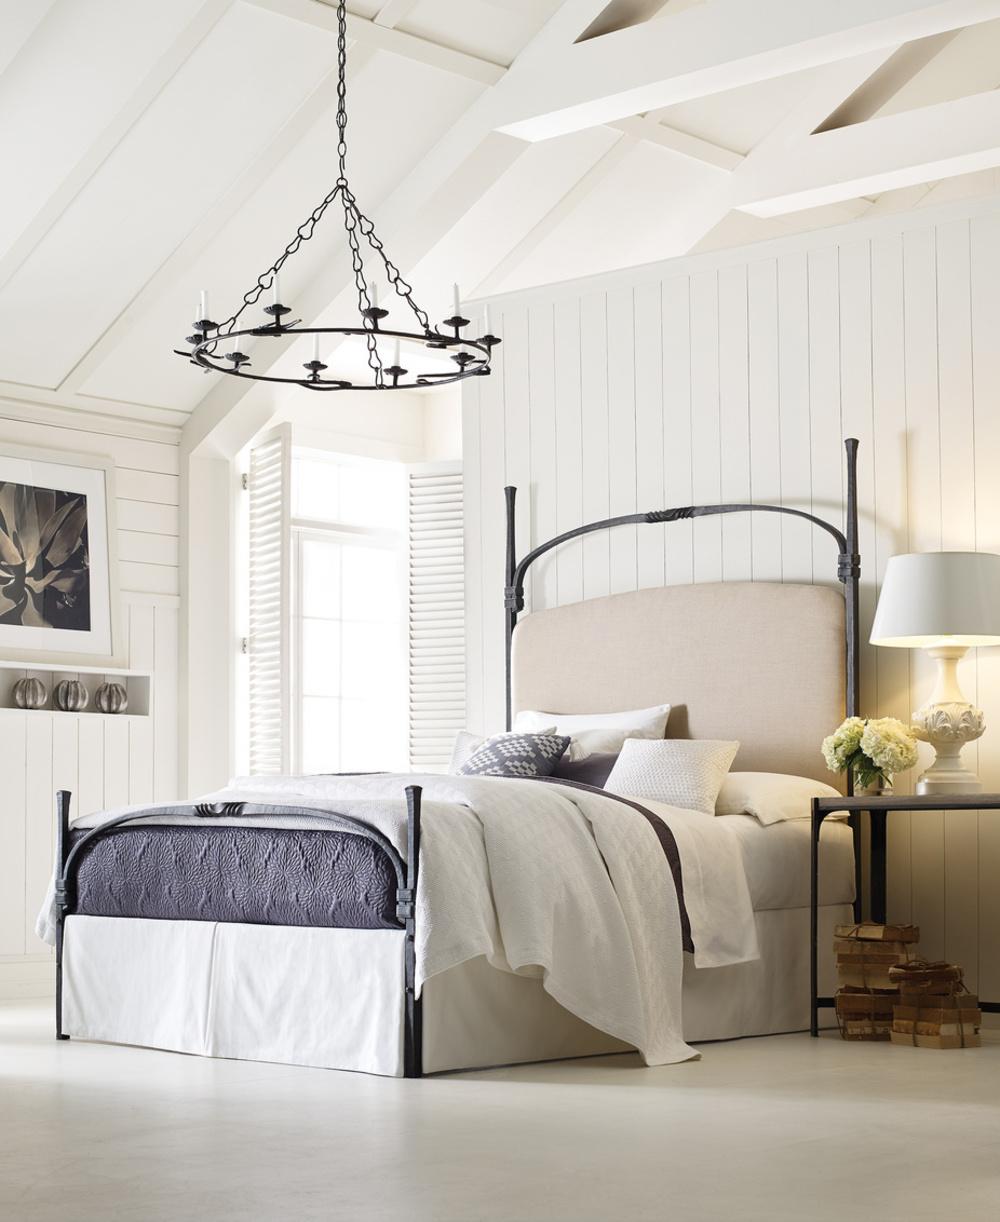 Charleston Forge - Omega Bed